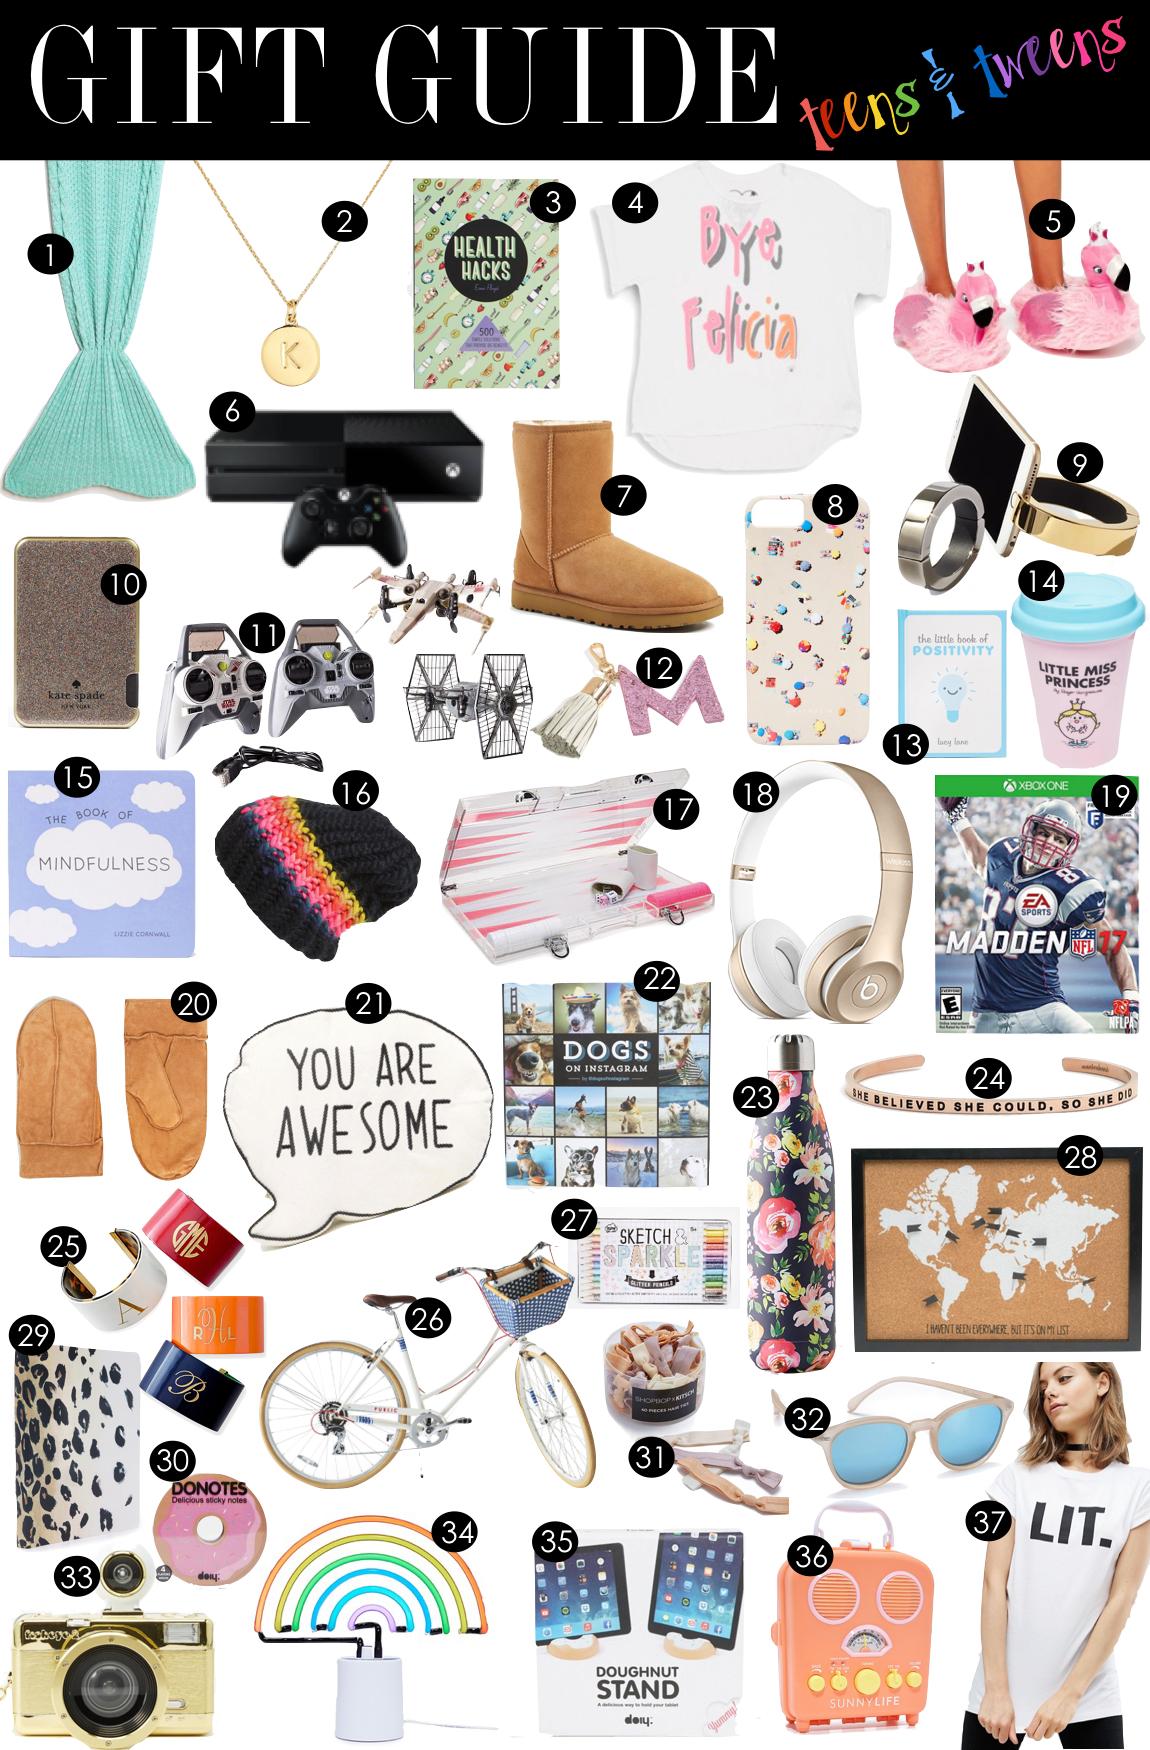 Gift Guide for Teens + Tweens |  Kiki's List